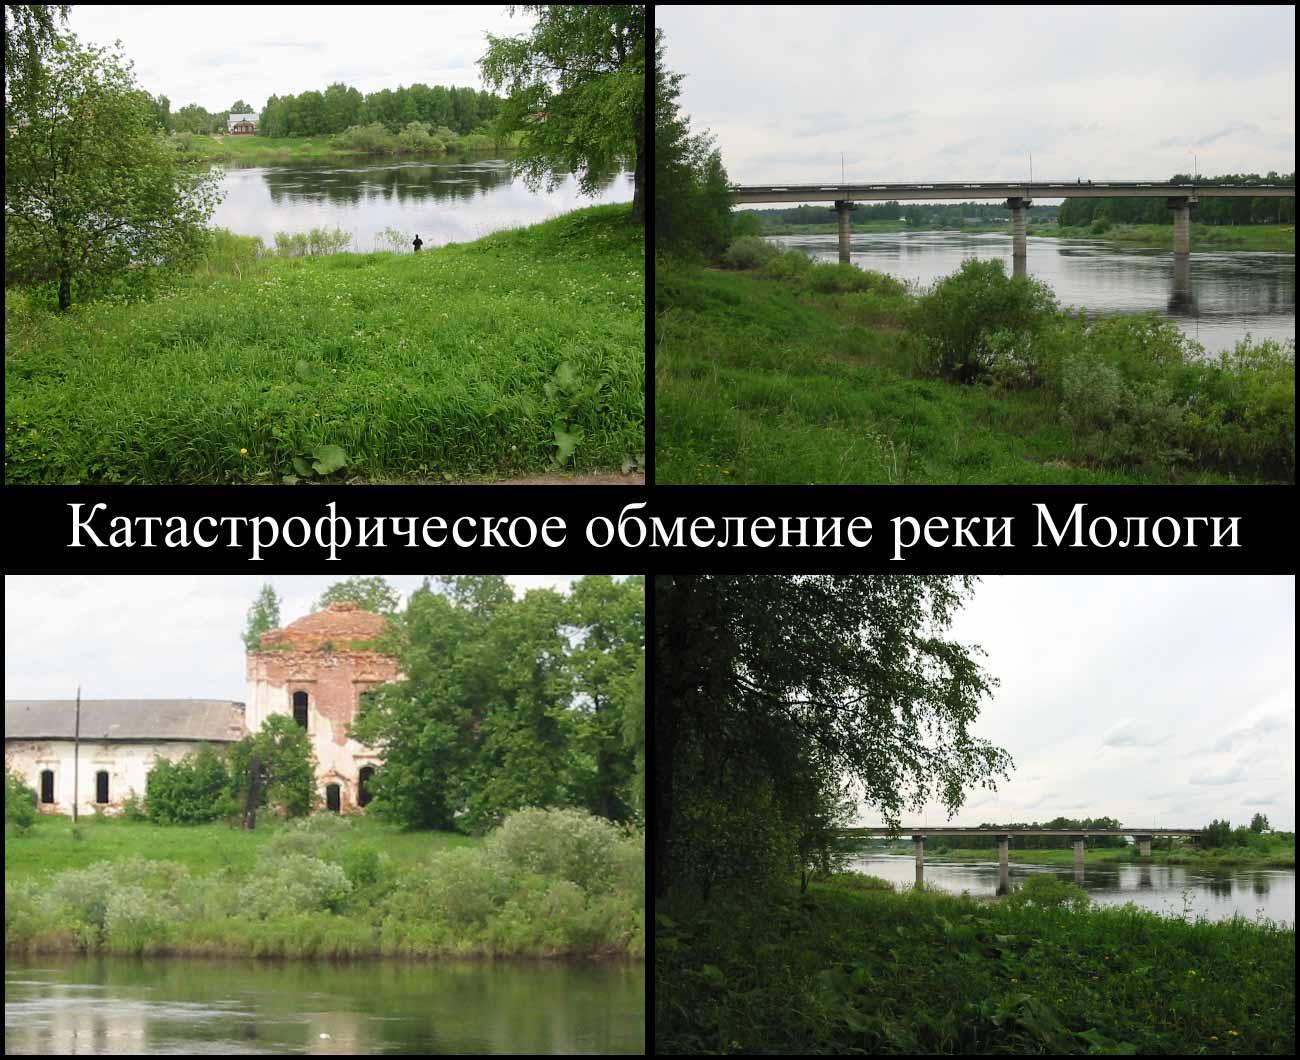 RekiMologaUstuzhna1